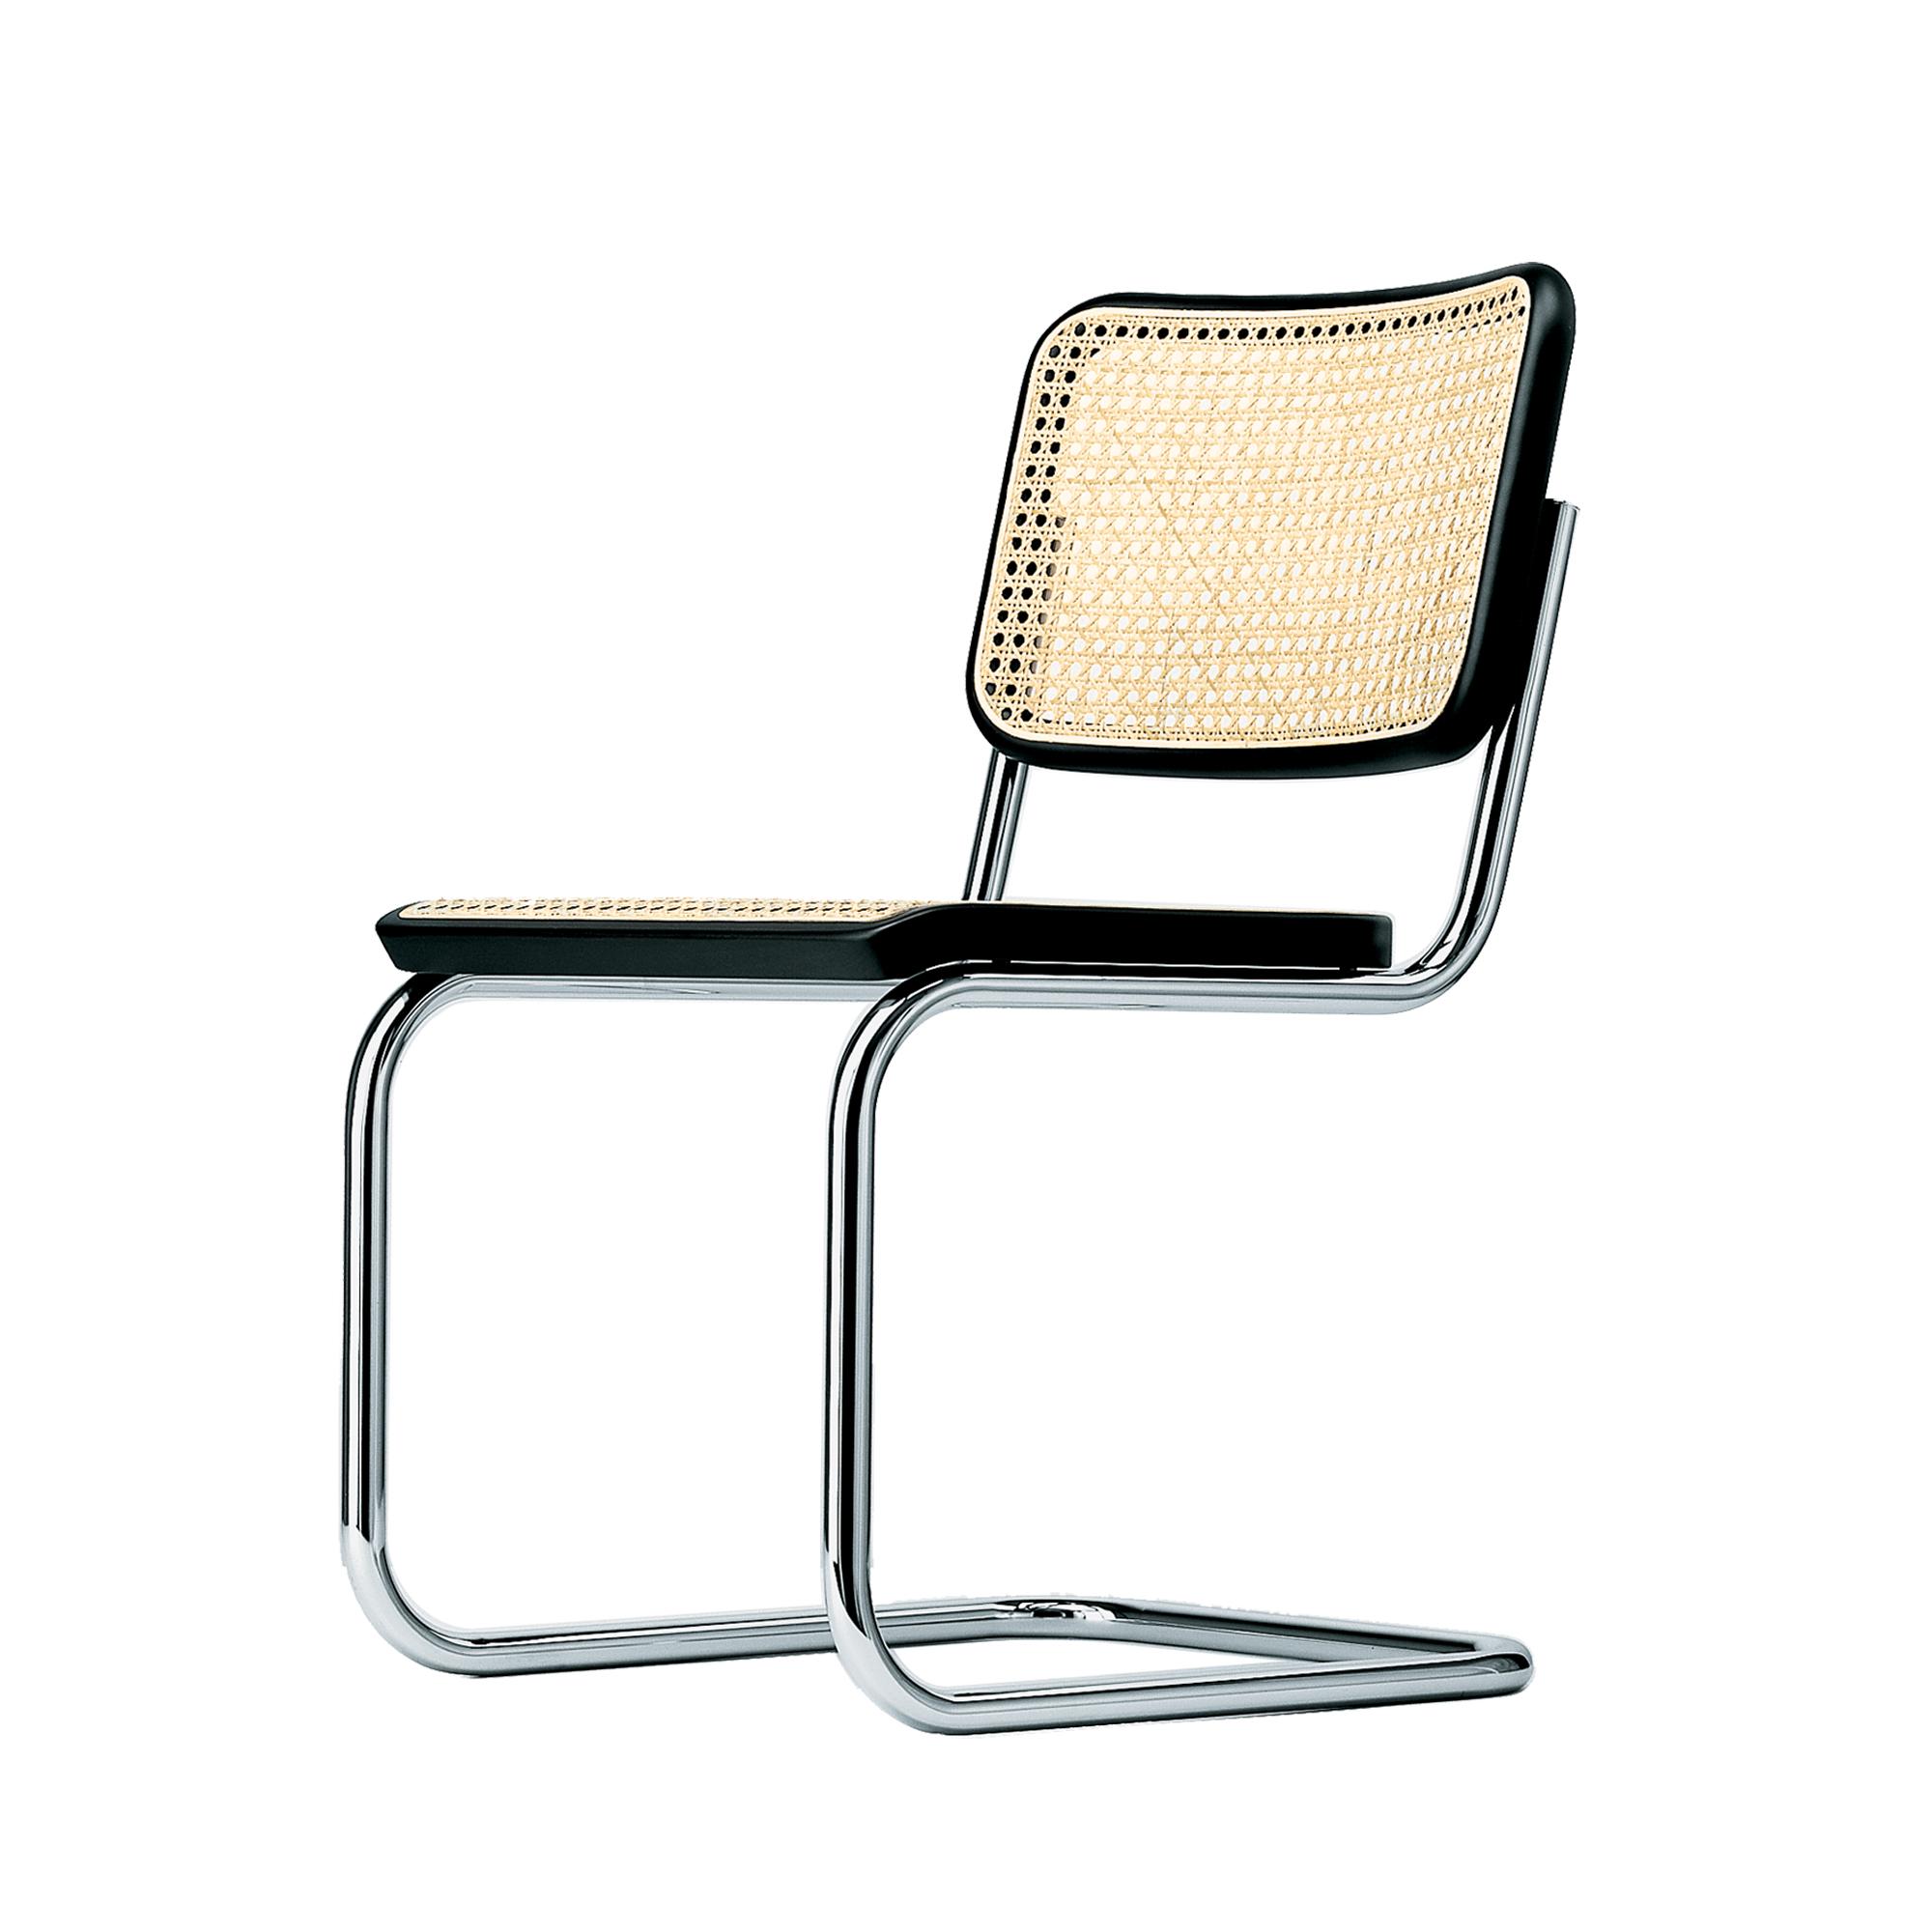 Thonet Stuhl S 32 Stahlrohrklassiker Mit Rohrgeflecht Designikonen Designmobel Shop